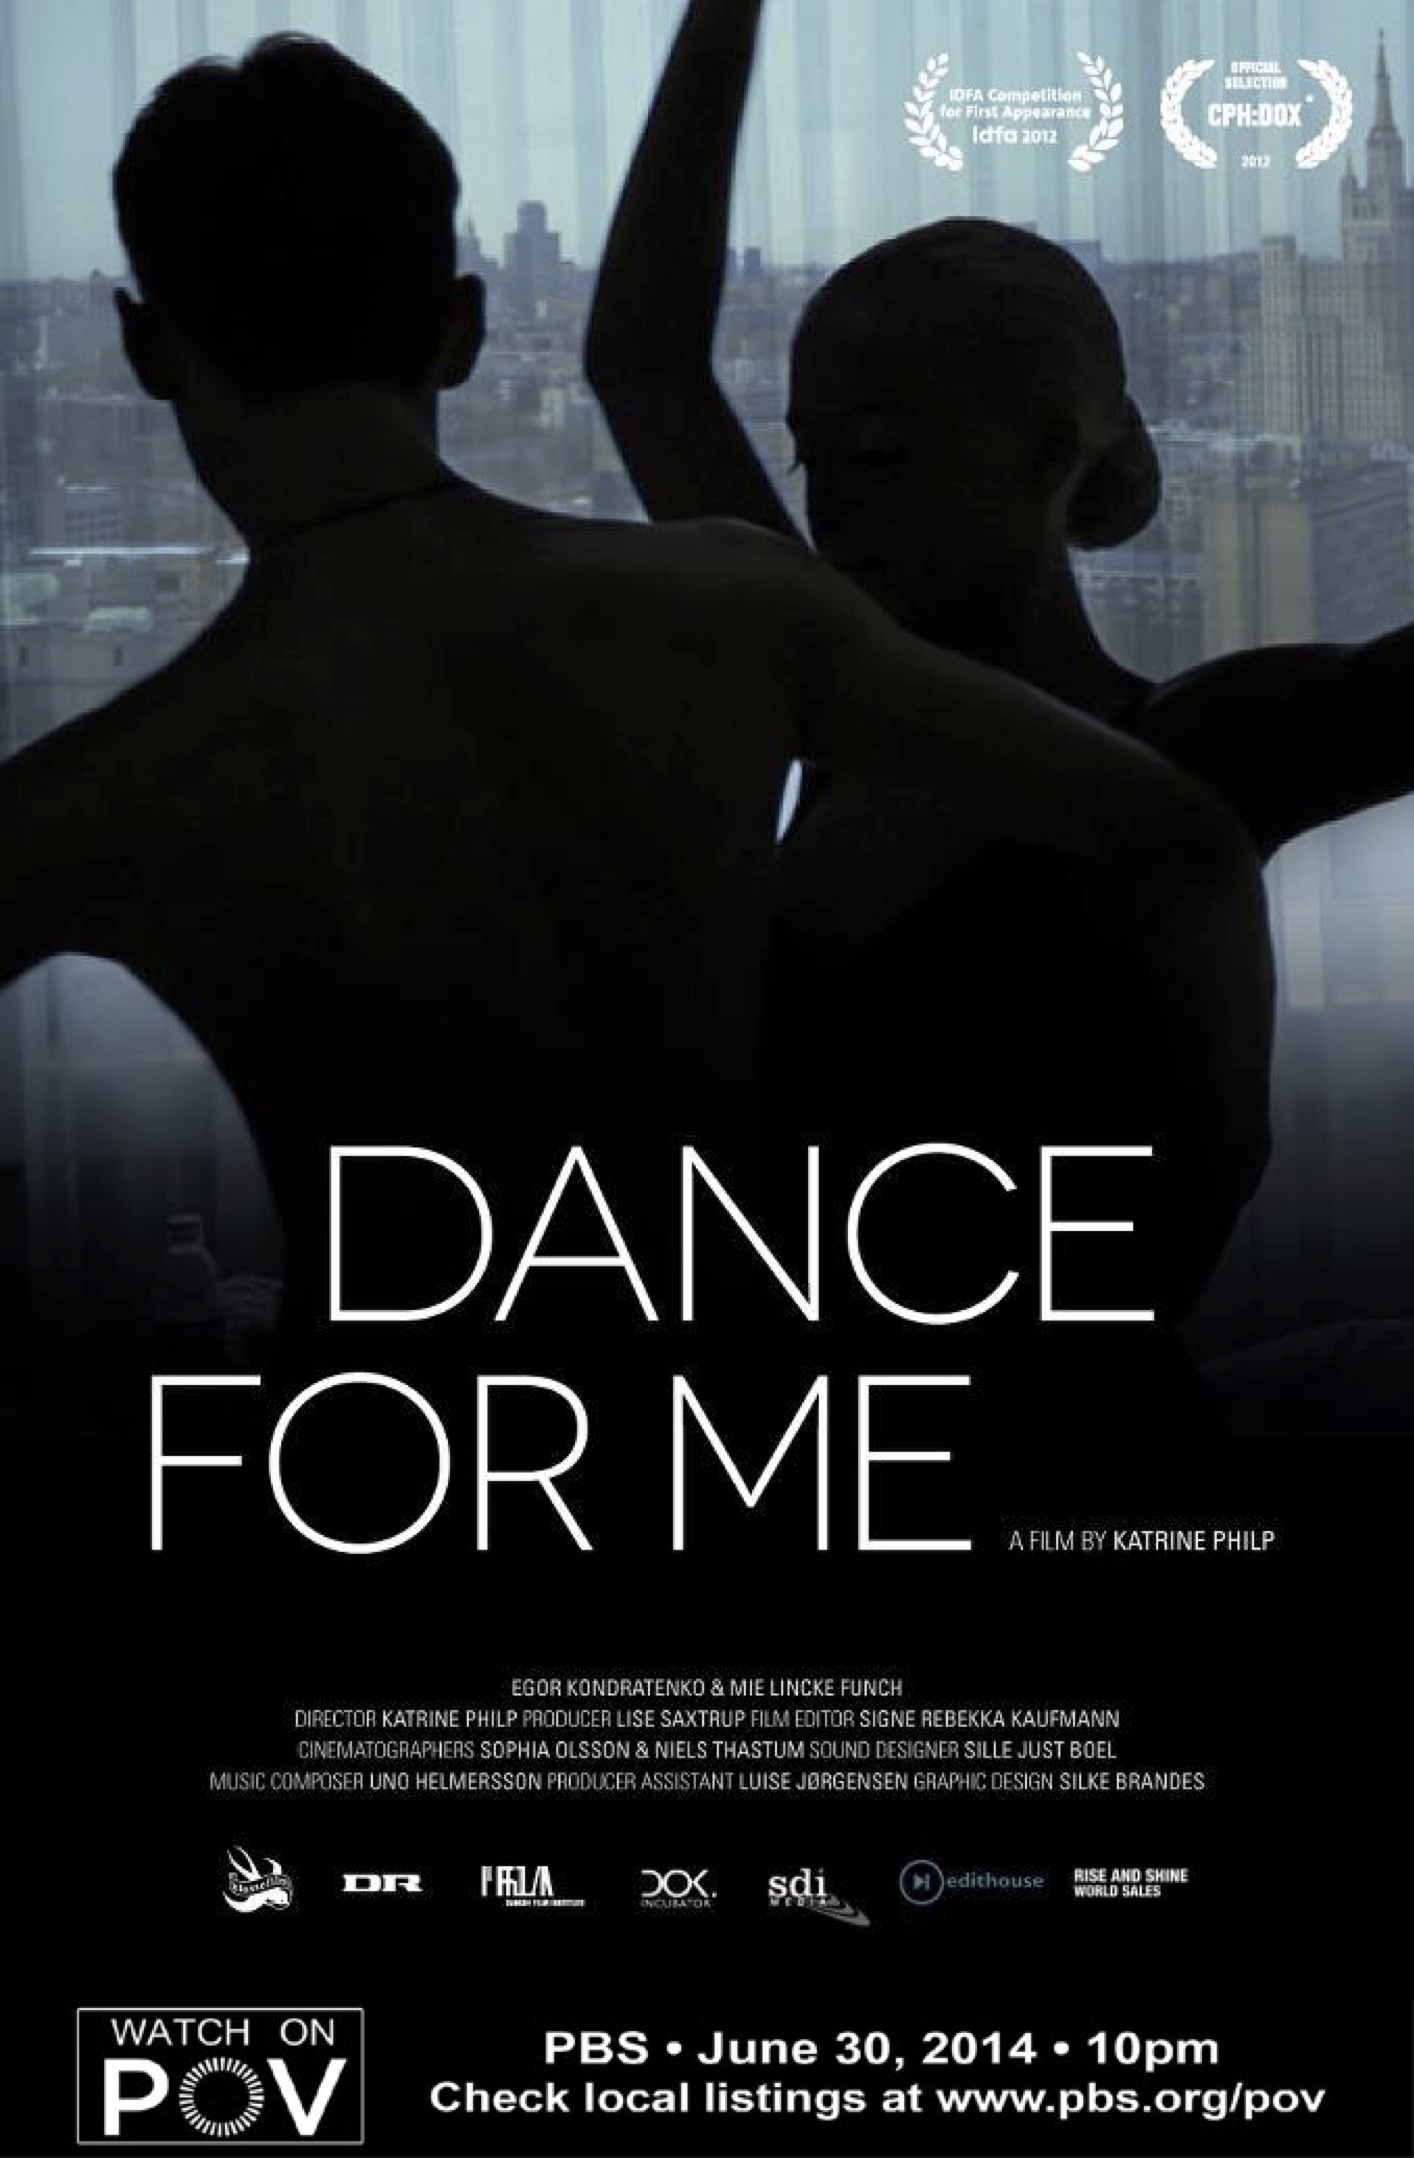 broadcast-poster-dance-for-me-pov.jpg